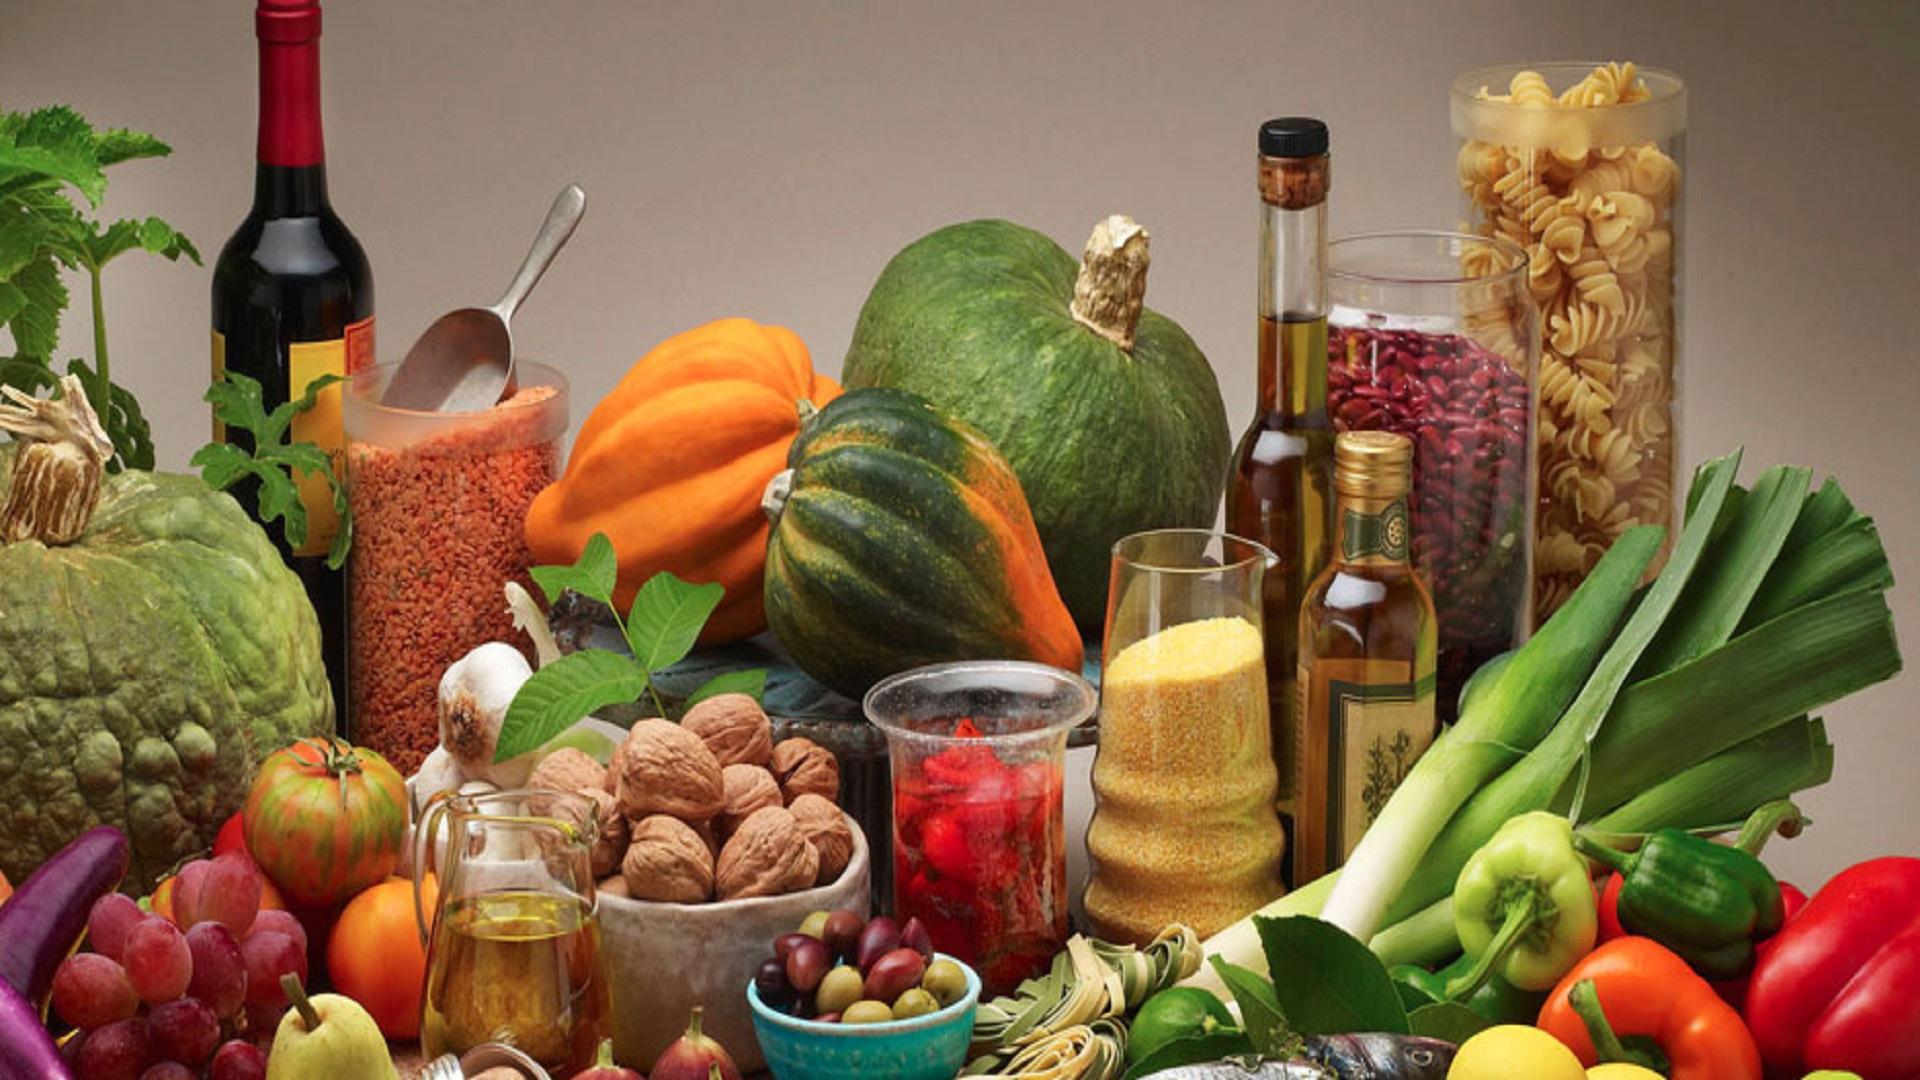 Vallo dieta mediterranea provoca cancro pellegrino denuncia lemme - La mediterranea ...